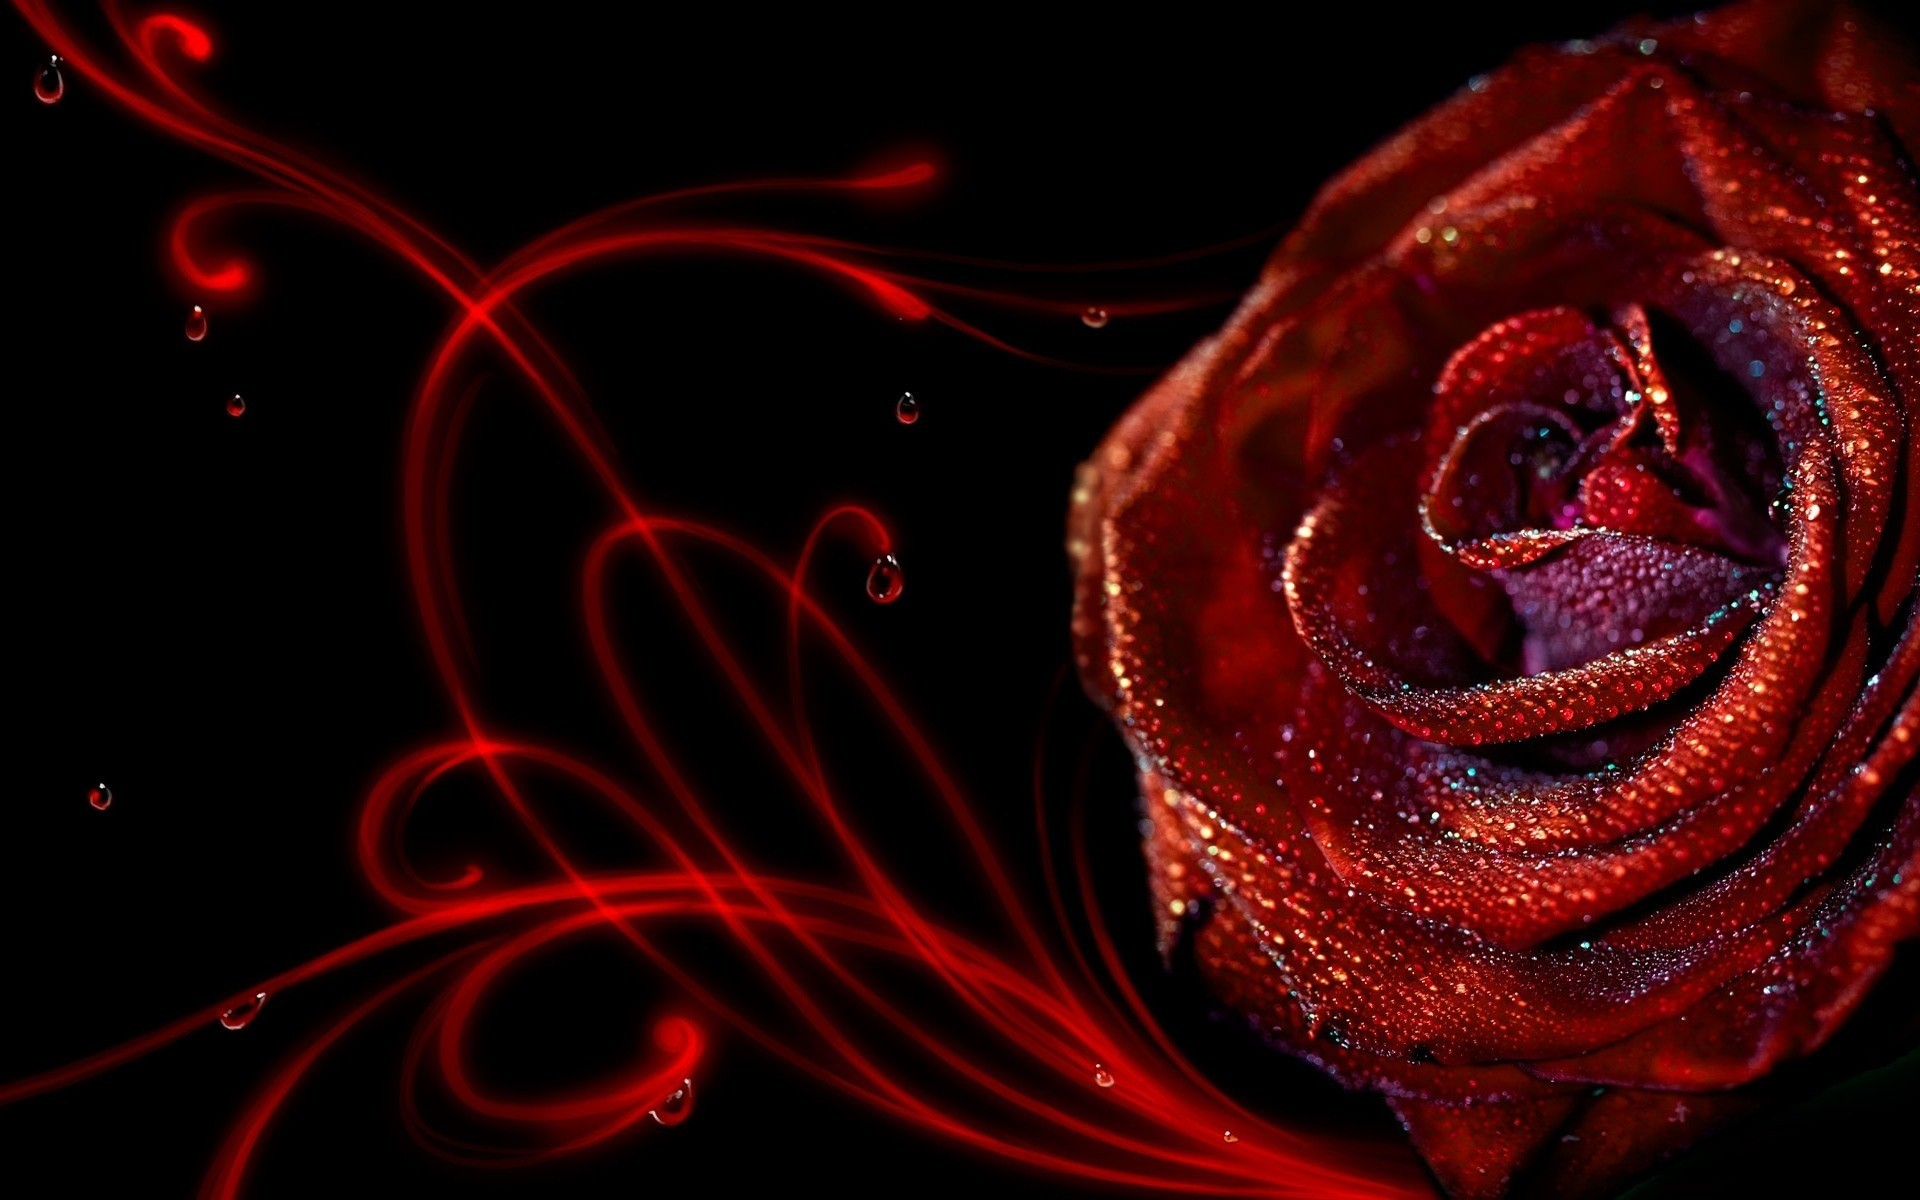 Black Silk Wallpaper Red Rose Black Silk Wallpaper Red Rose